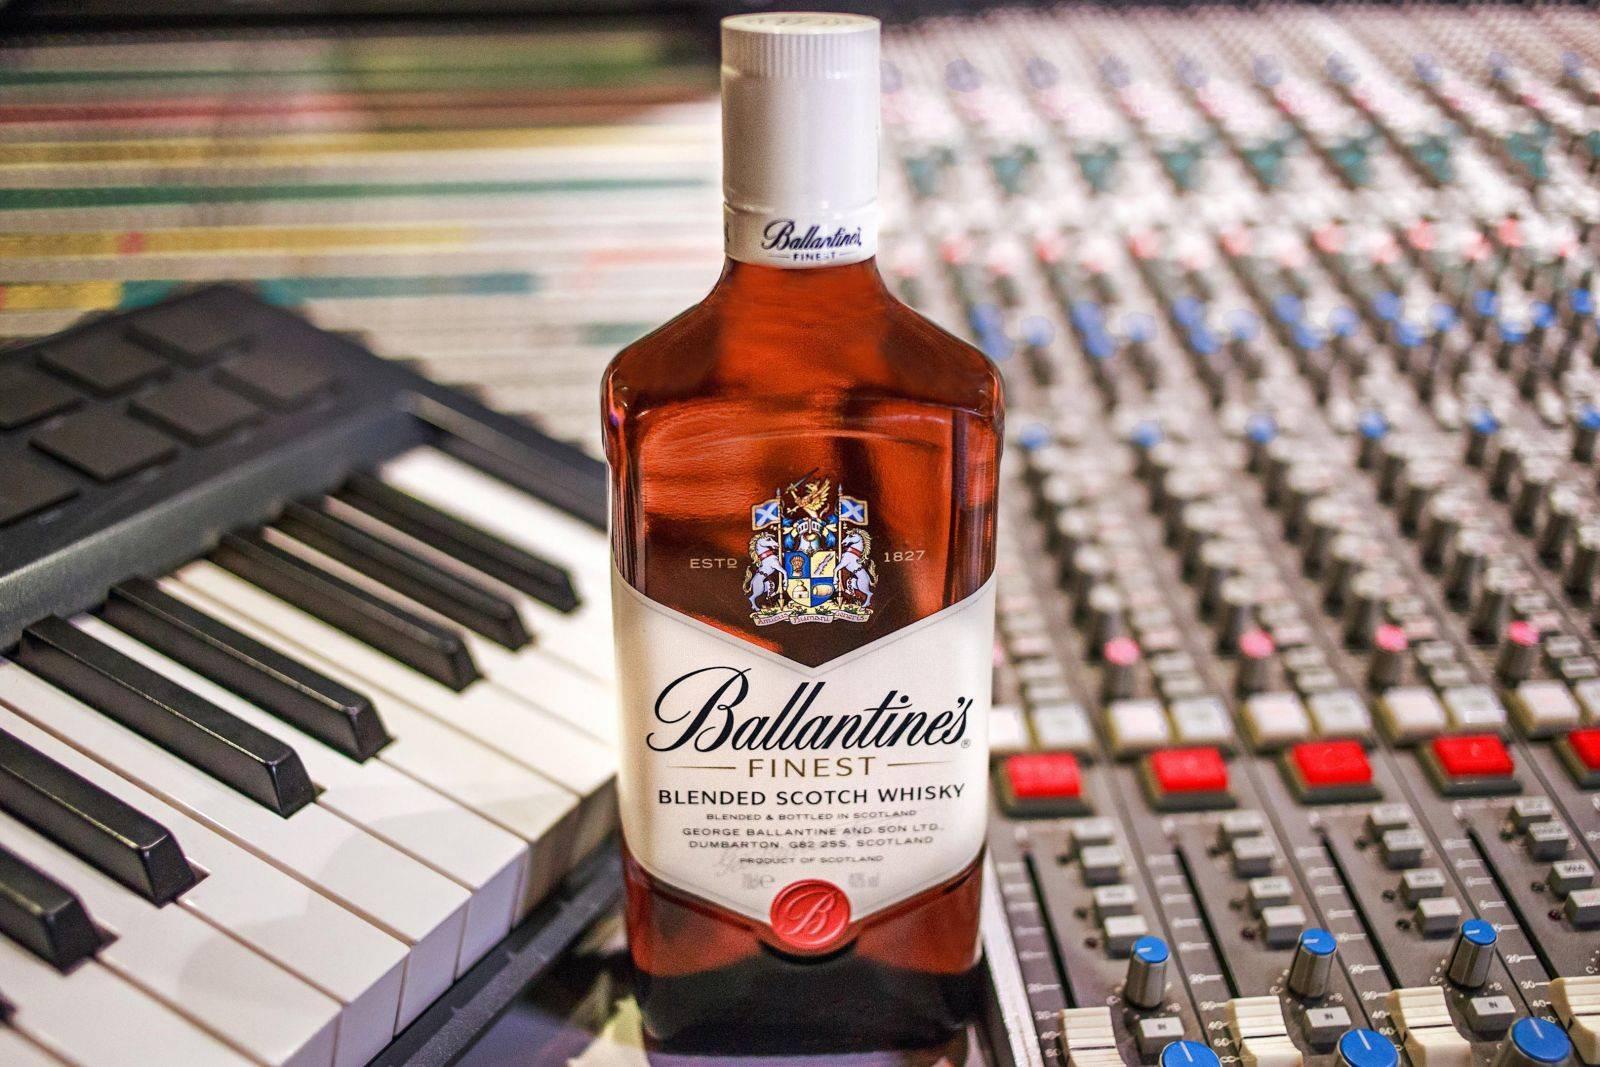 Виски ballantine's (баллантайнс): особенности вкуса и обзор линейки скотча - международная платформа для барменов inshaker